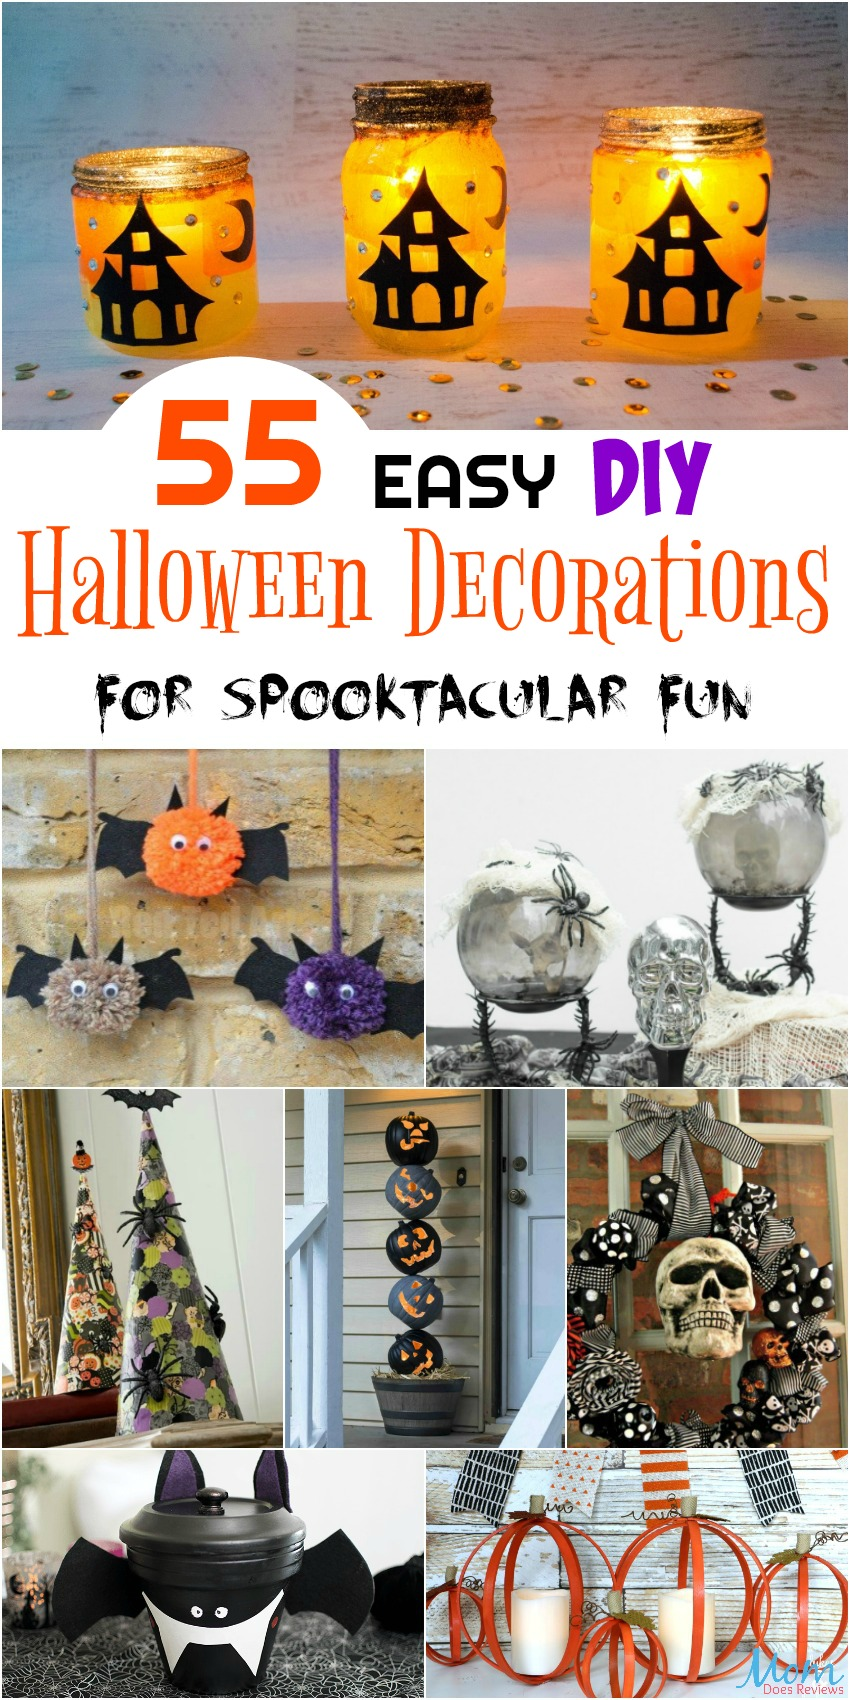 55 Easy DIY Halloween Decorations for Spooktacular Fun #halloween #diy #decor